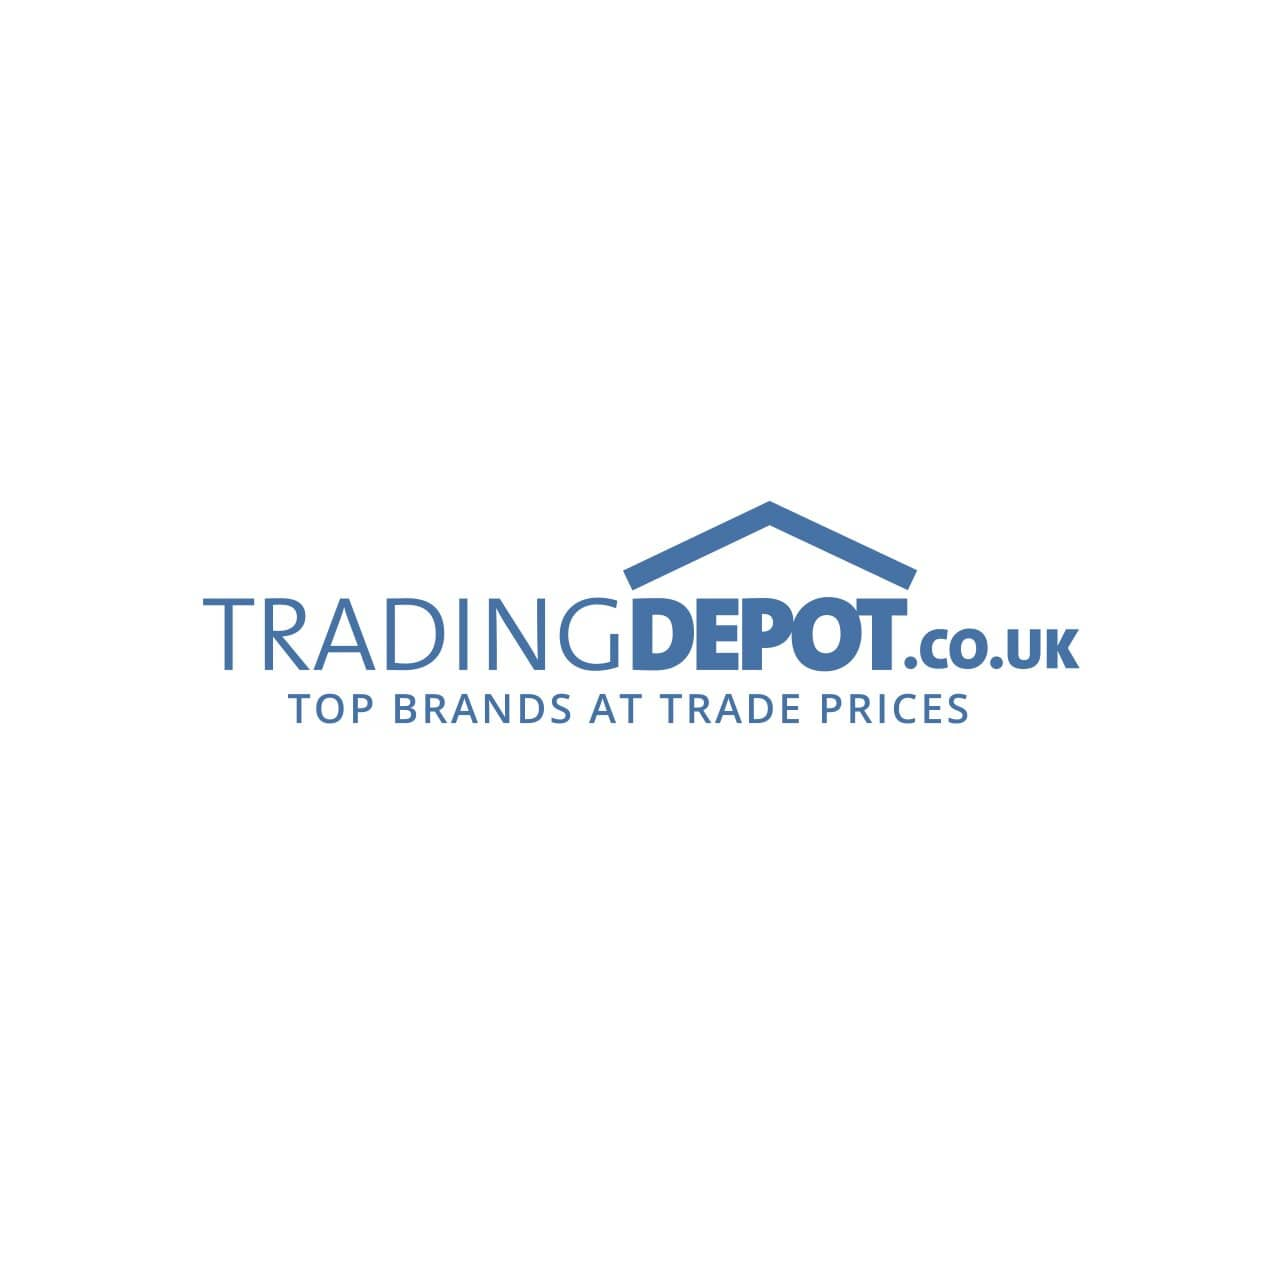 Britool Expert Flexible Head Ratchet Spanner Set 12 Piece Metric - BRIE111102B